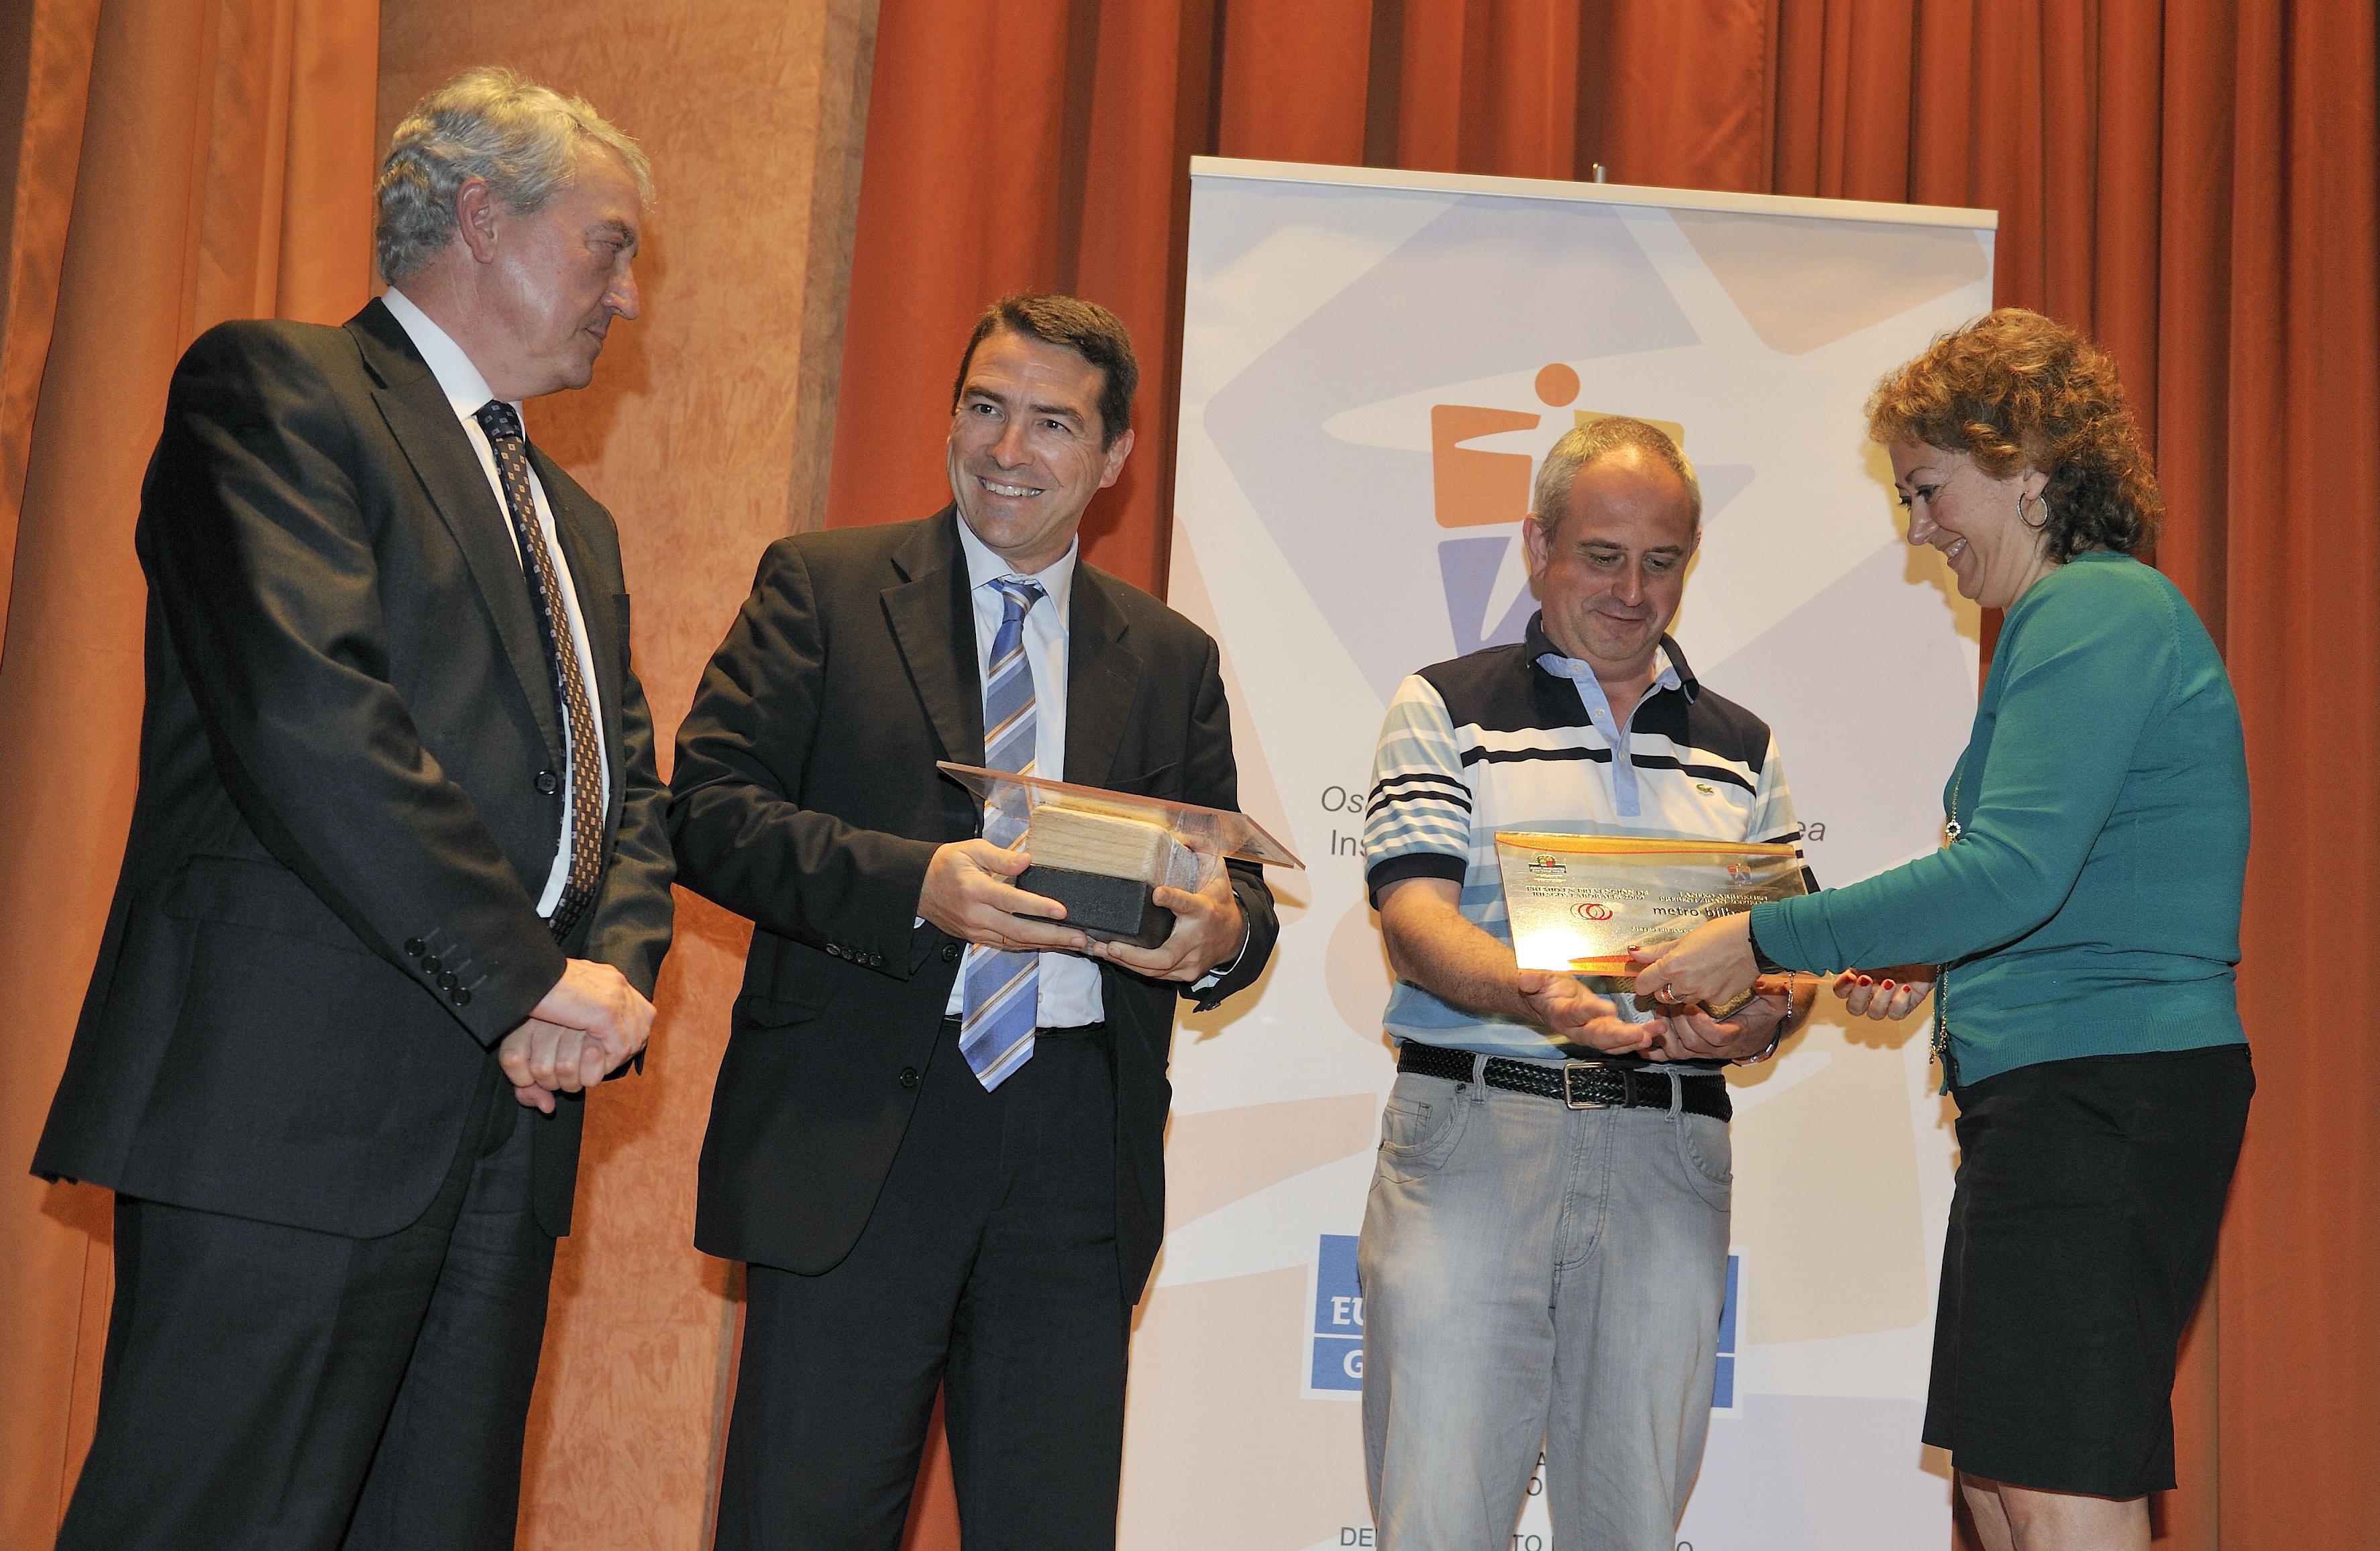 premios_osalan3.jpg